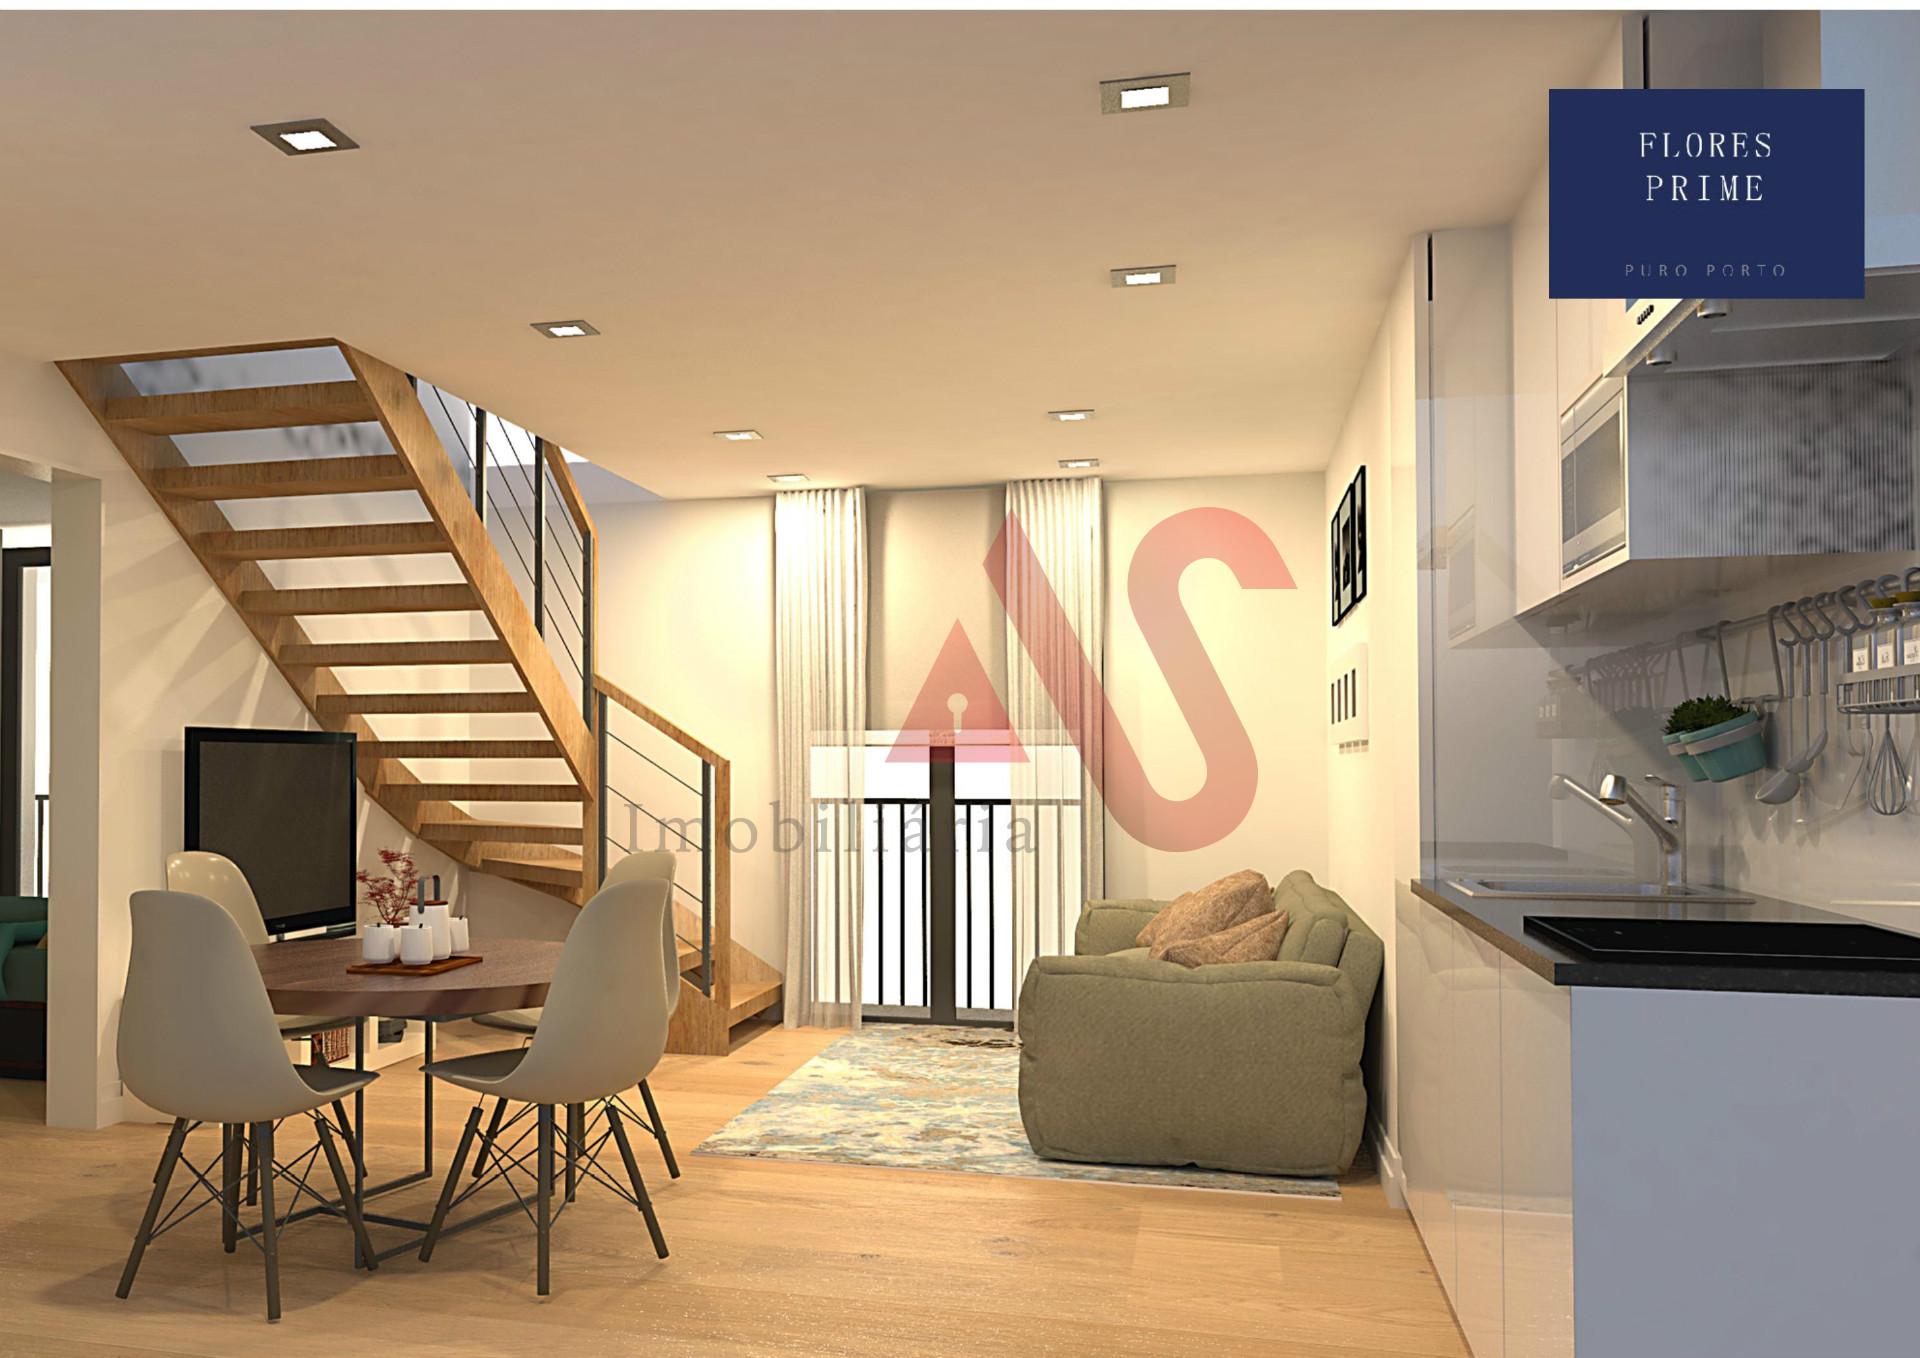 Apartamento T2+1 Duplex inserido no Empreendimento Flores Prime